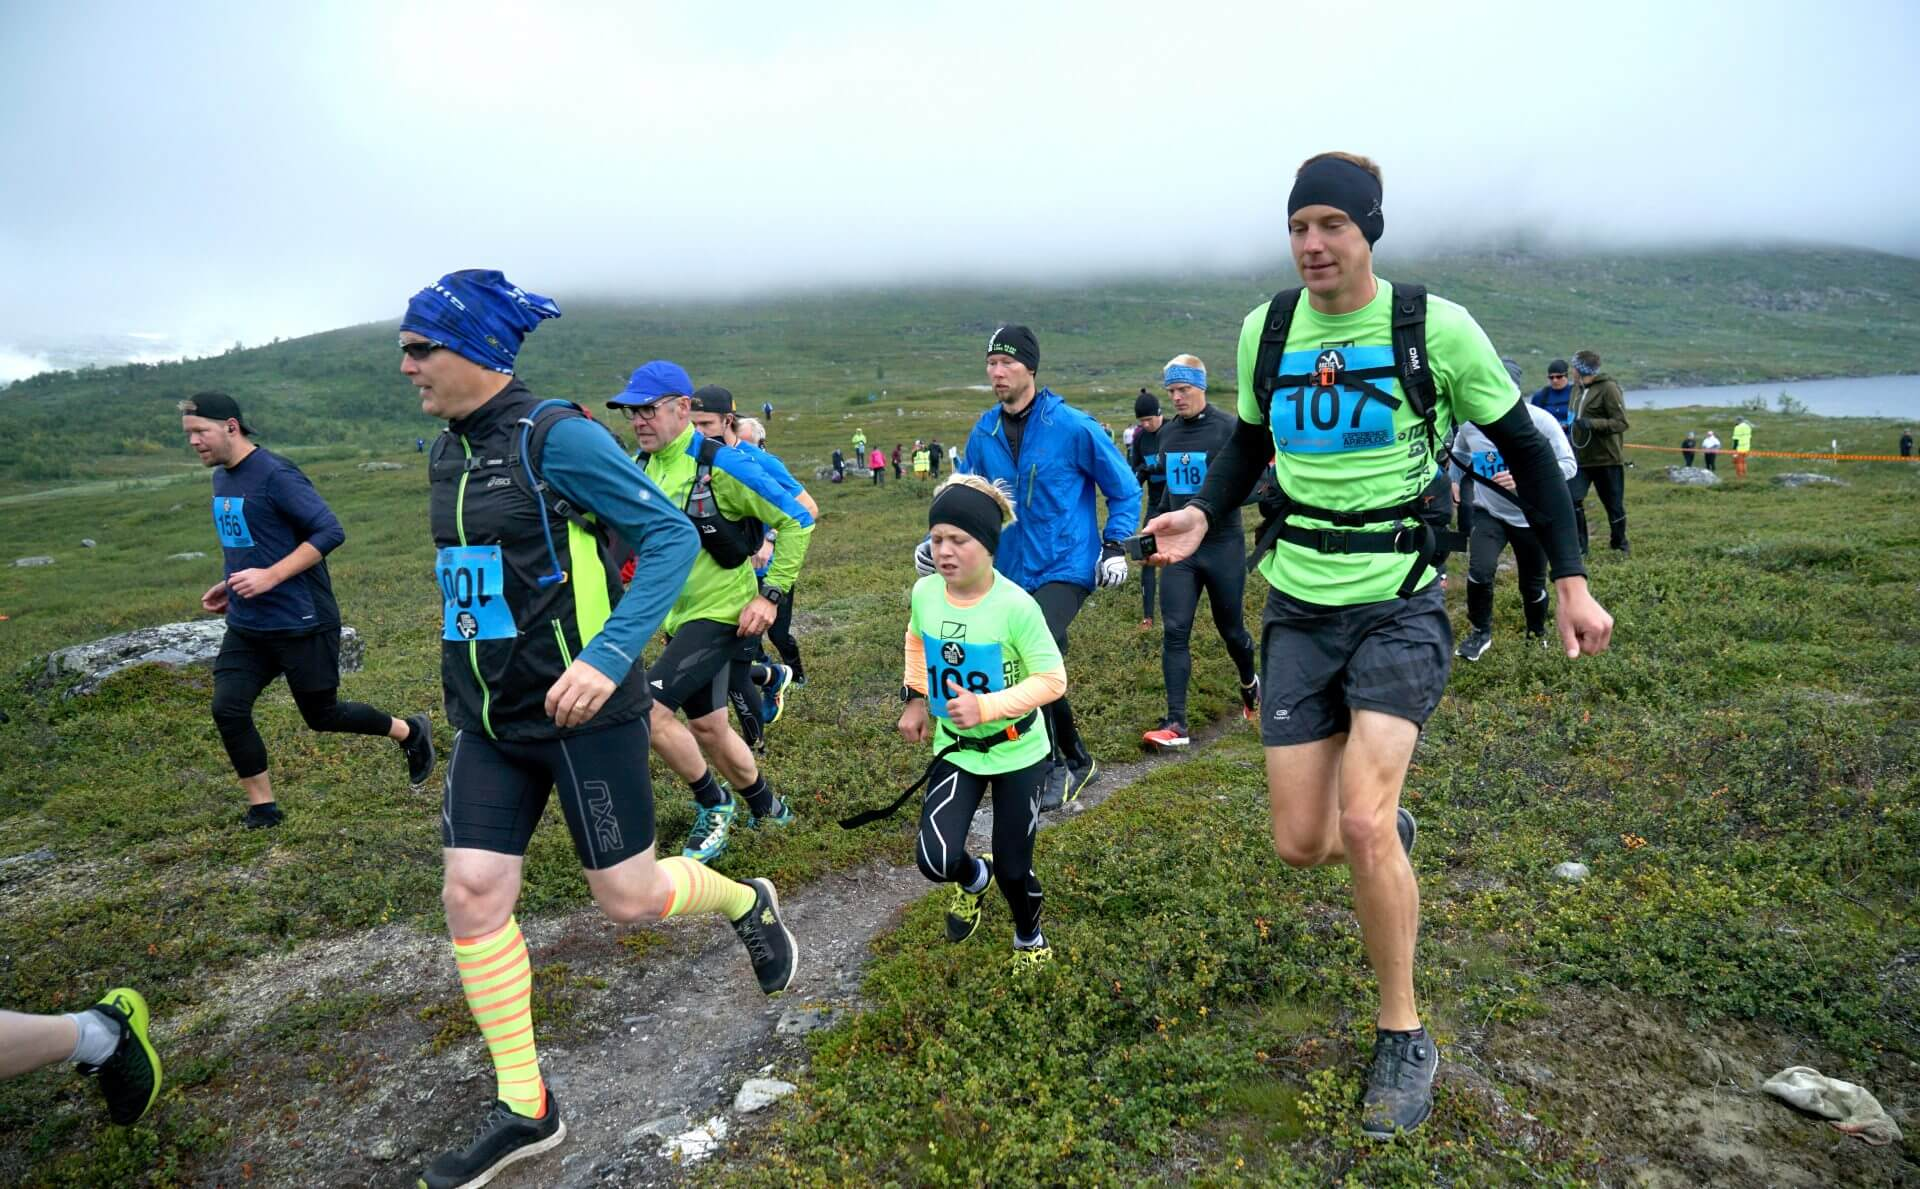 Arctic Circle Race 2019 Polcirkelloppet Guijaure start 107 108B